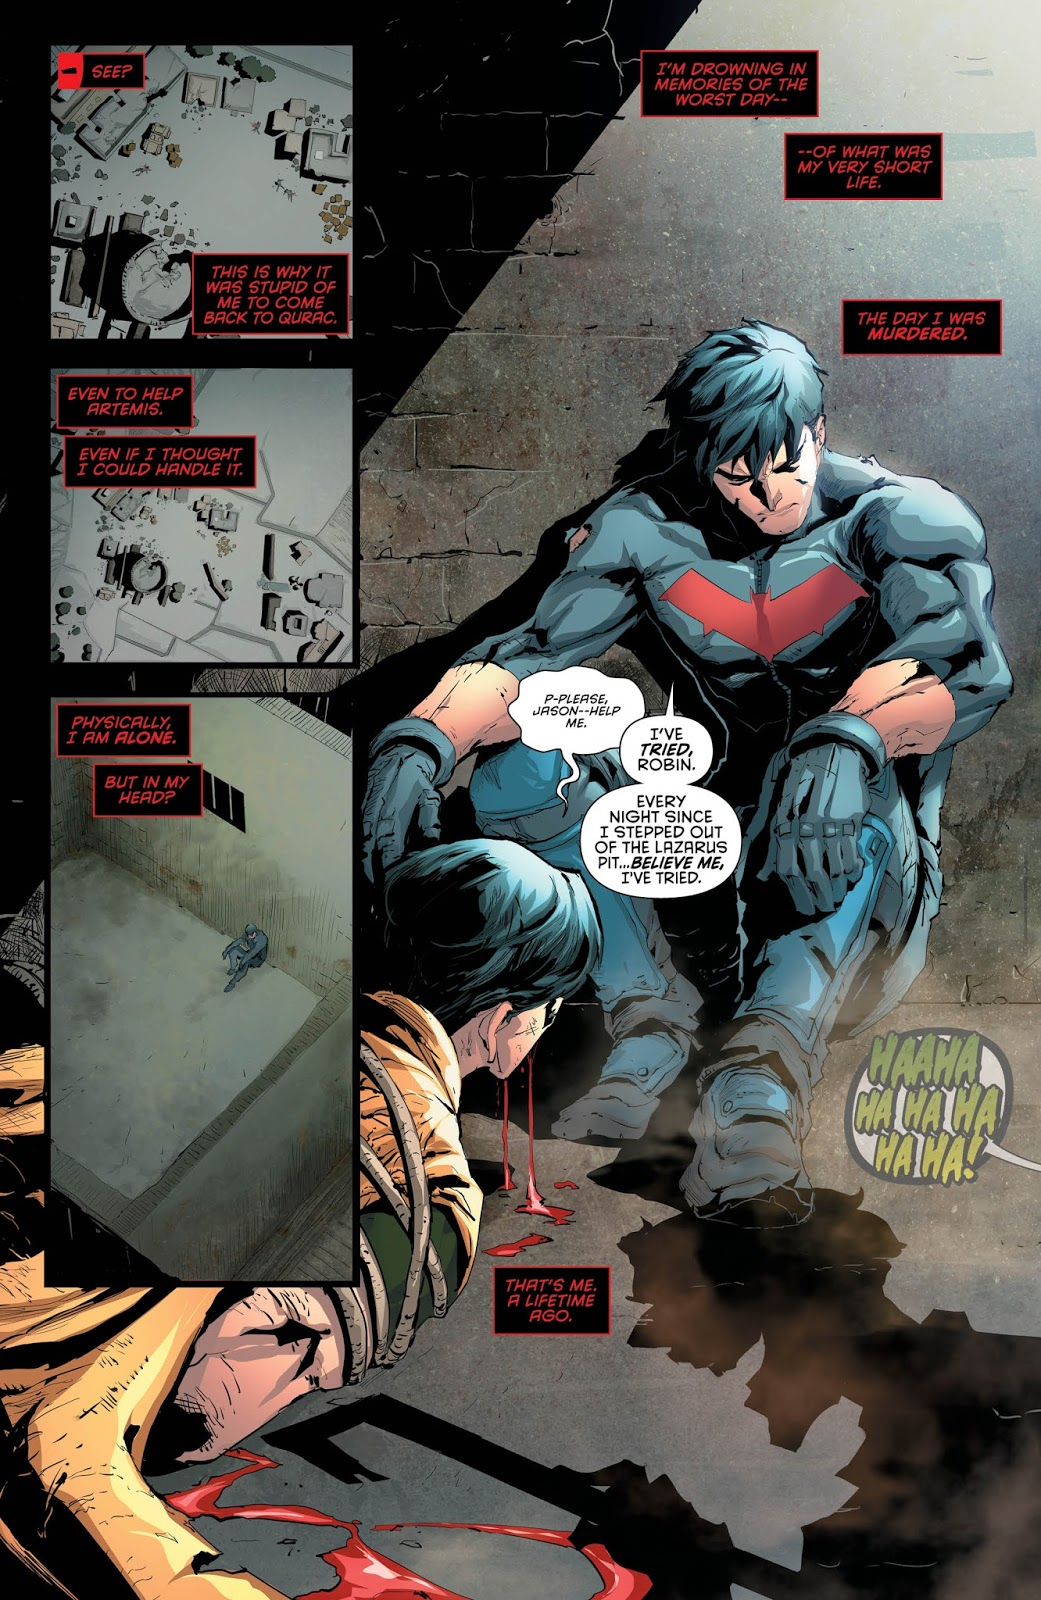 M Night Shyamalan Twist Weird Science DC Comic...